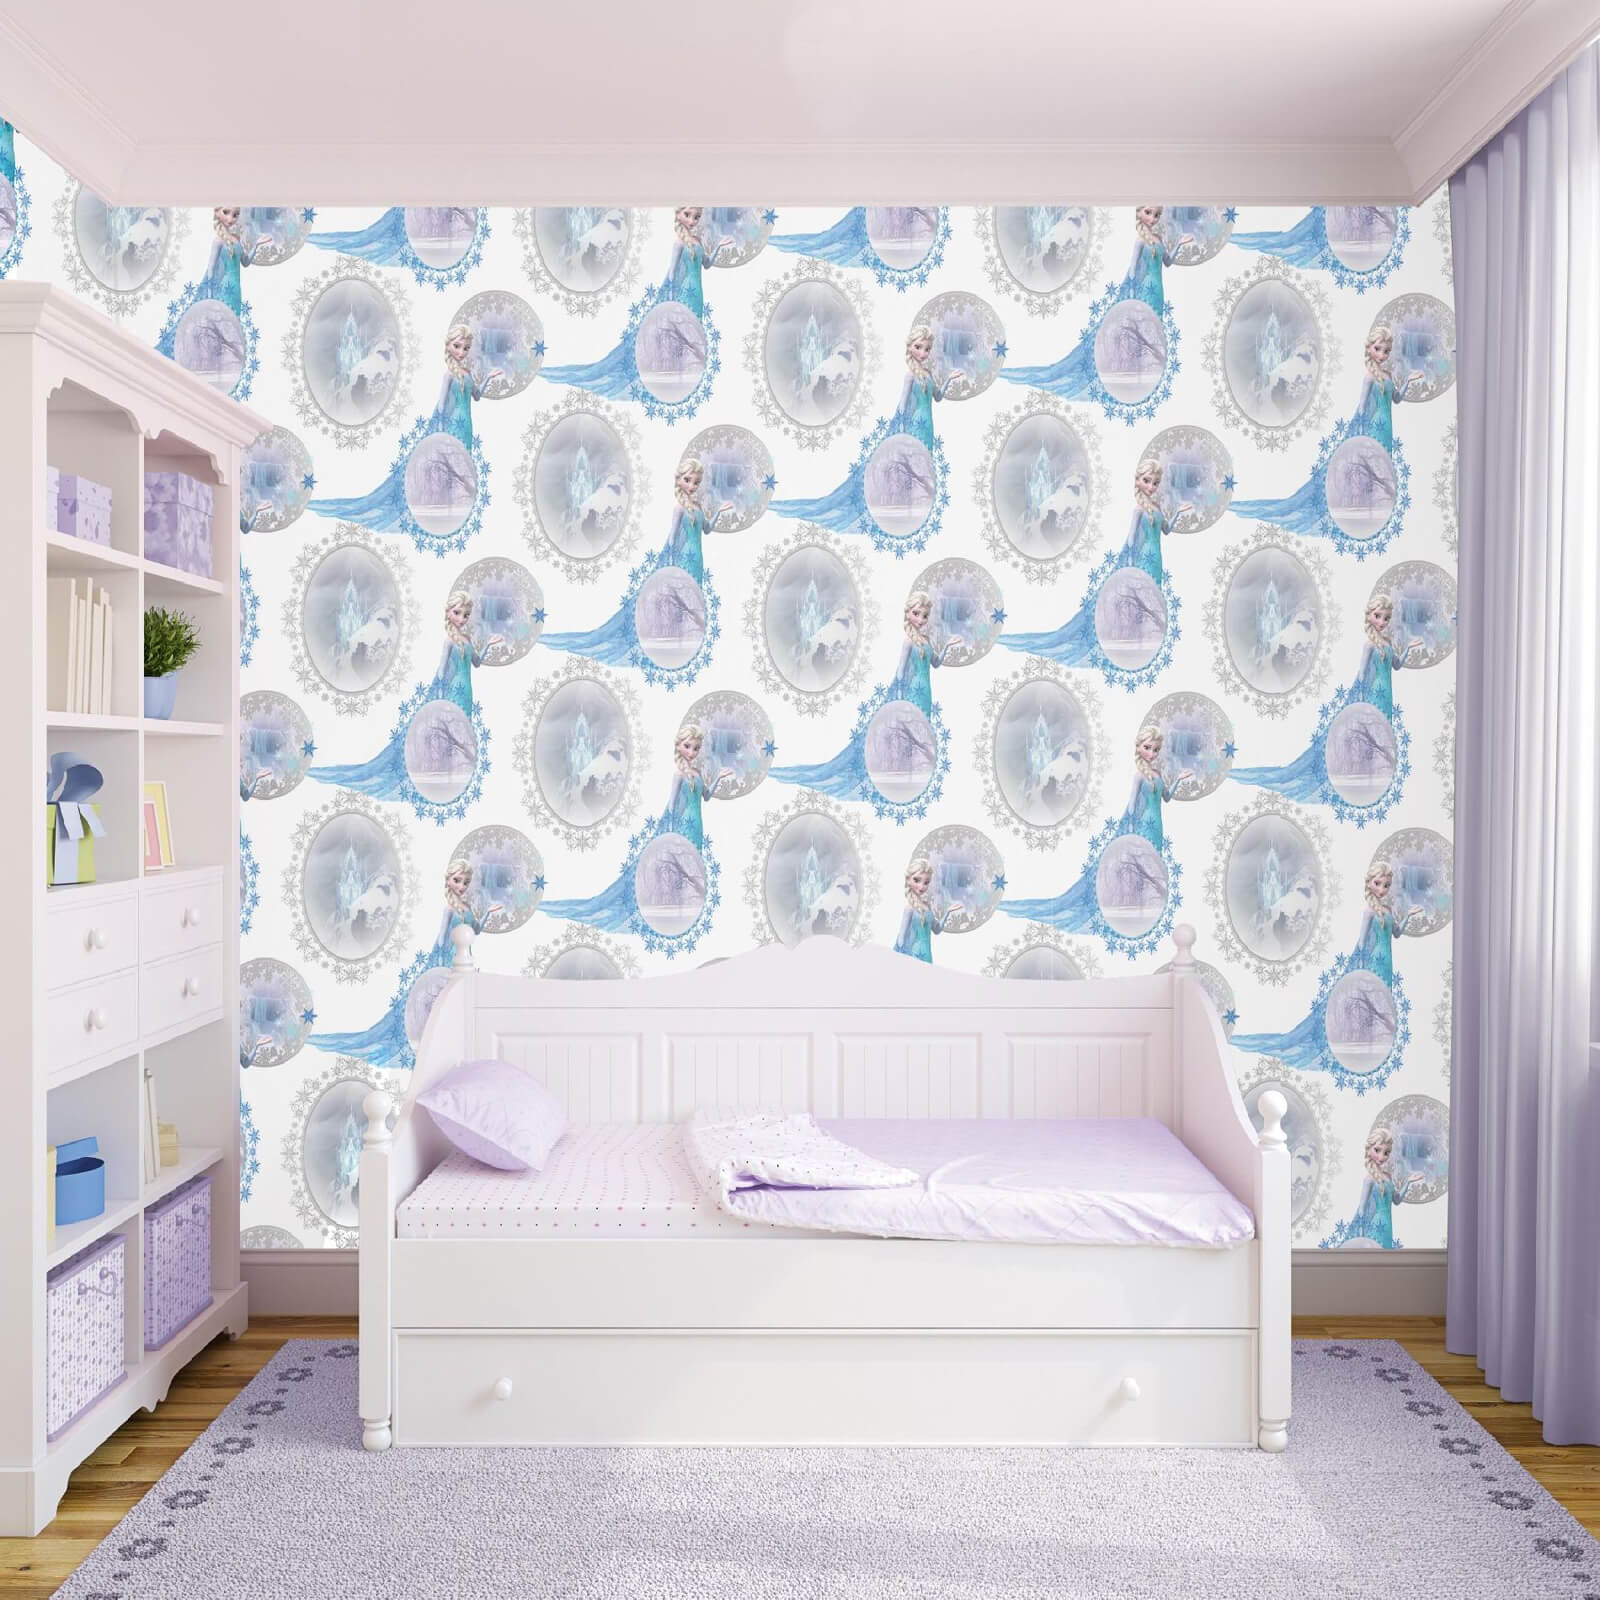 Disney Frozen Elsa Scene Subtle Shimmer Highlights Wallpaper